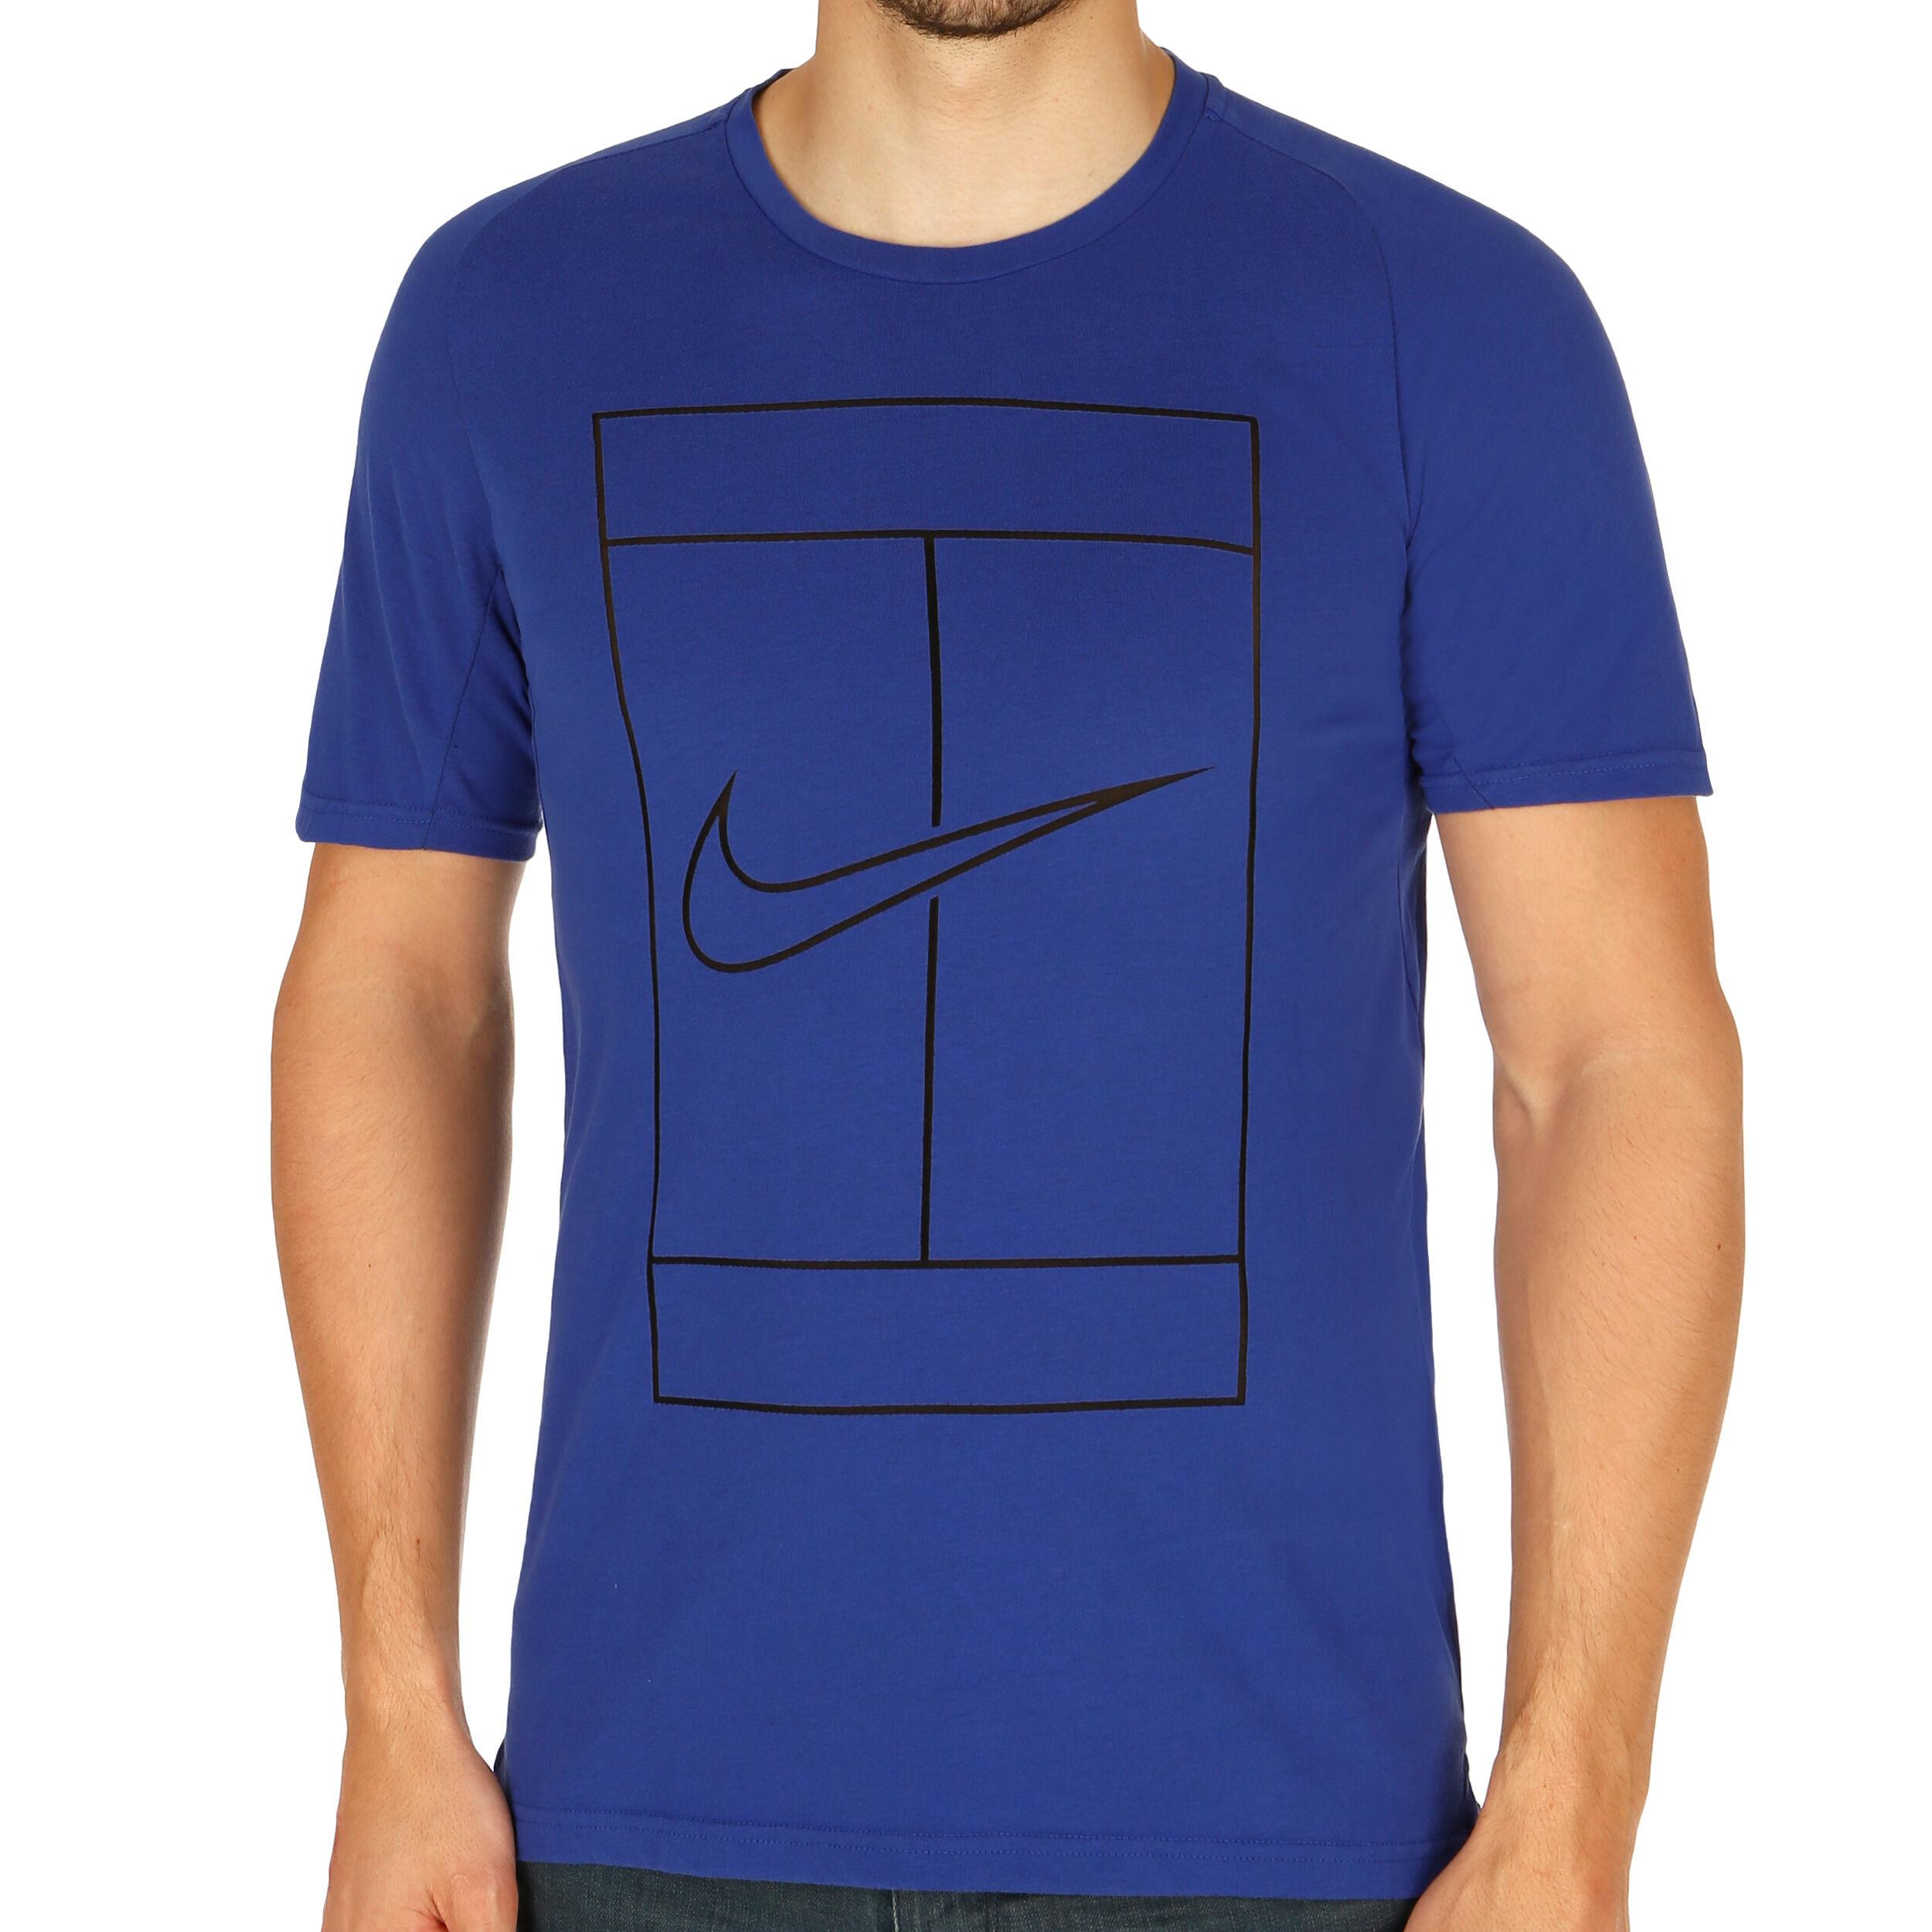 De Manga Hombres Camiseta Corta AzulNegro Nike Dry Court fyY76gmIvb